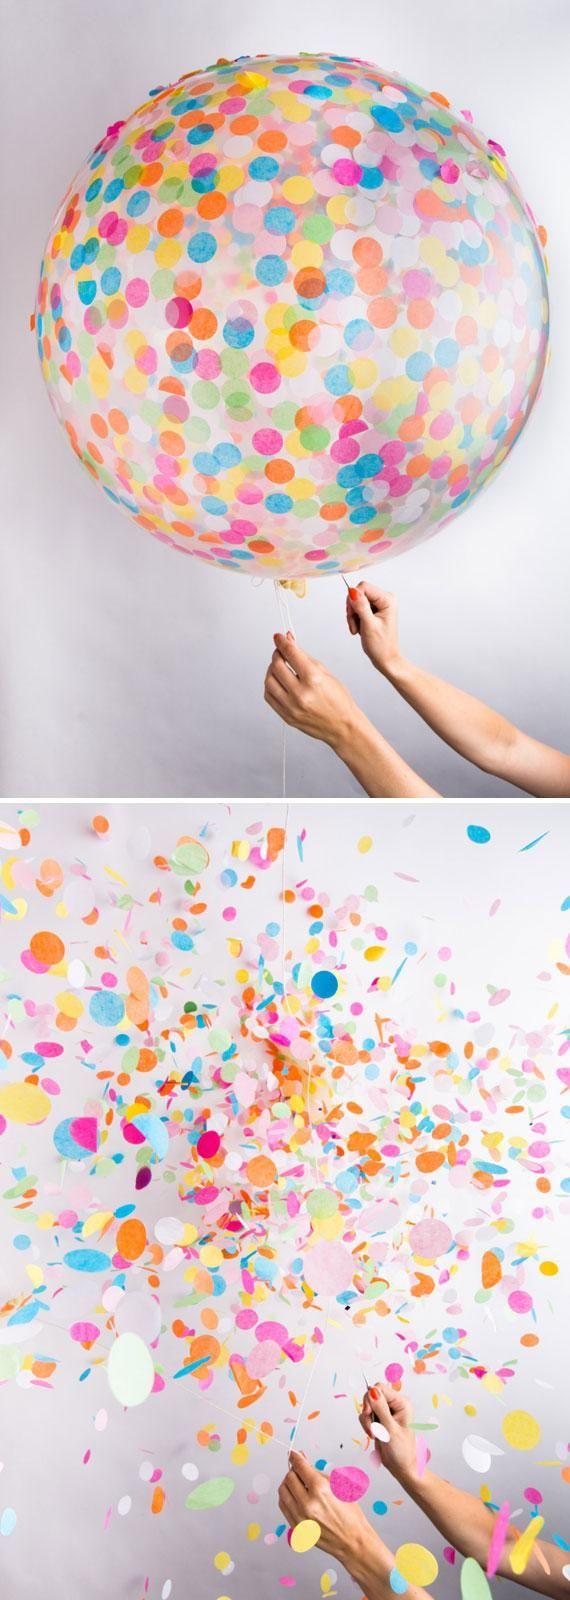 15 maneras de agregarle confeti a tu fiesta de xv a os for Como hacer confeti